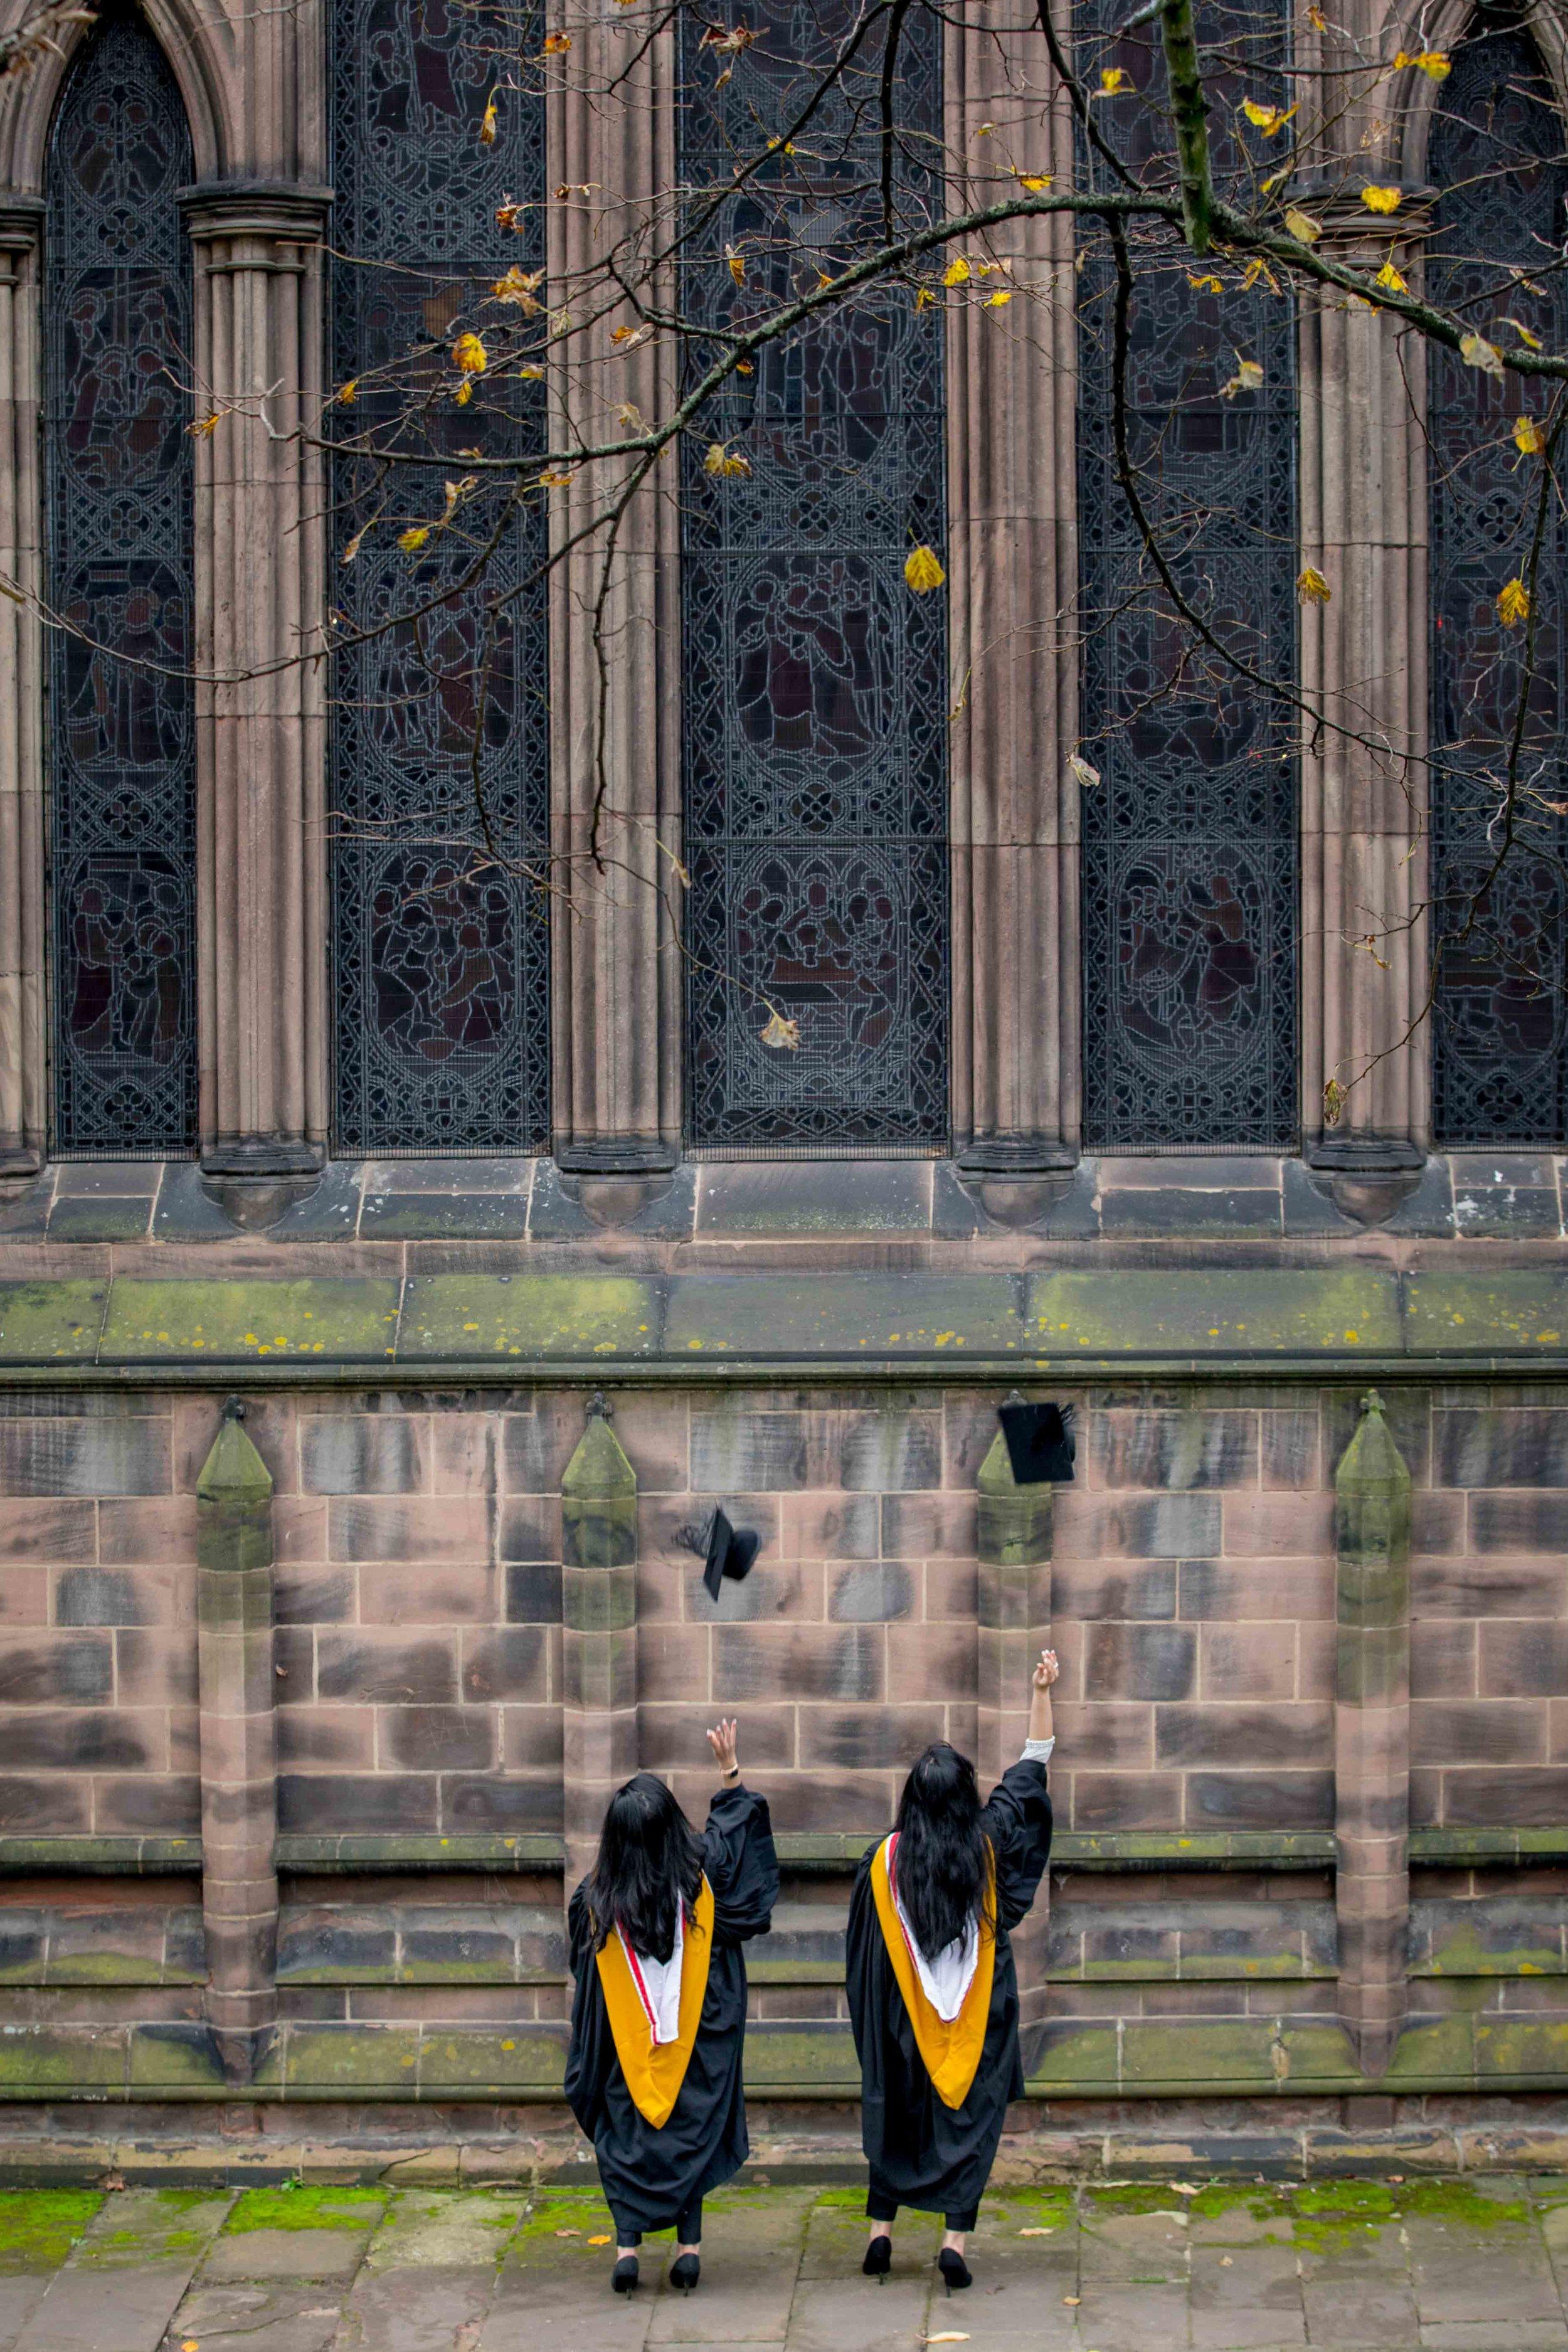 chester-university-graduation-ceremony-photography-photoshoot-graduation-photographer-Bristol-London-Cardiff-Birmingham-Chester-Natalia-smith-photography-6.jpg